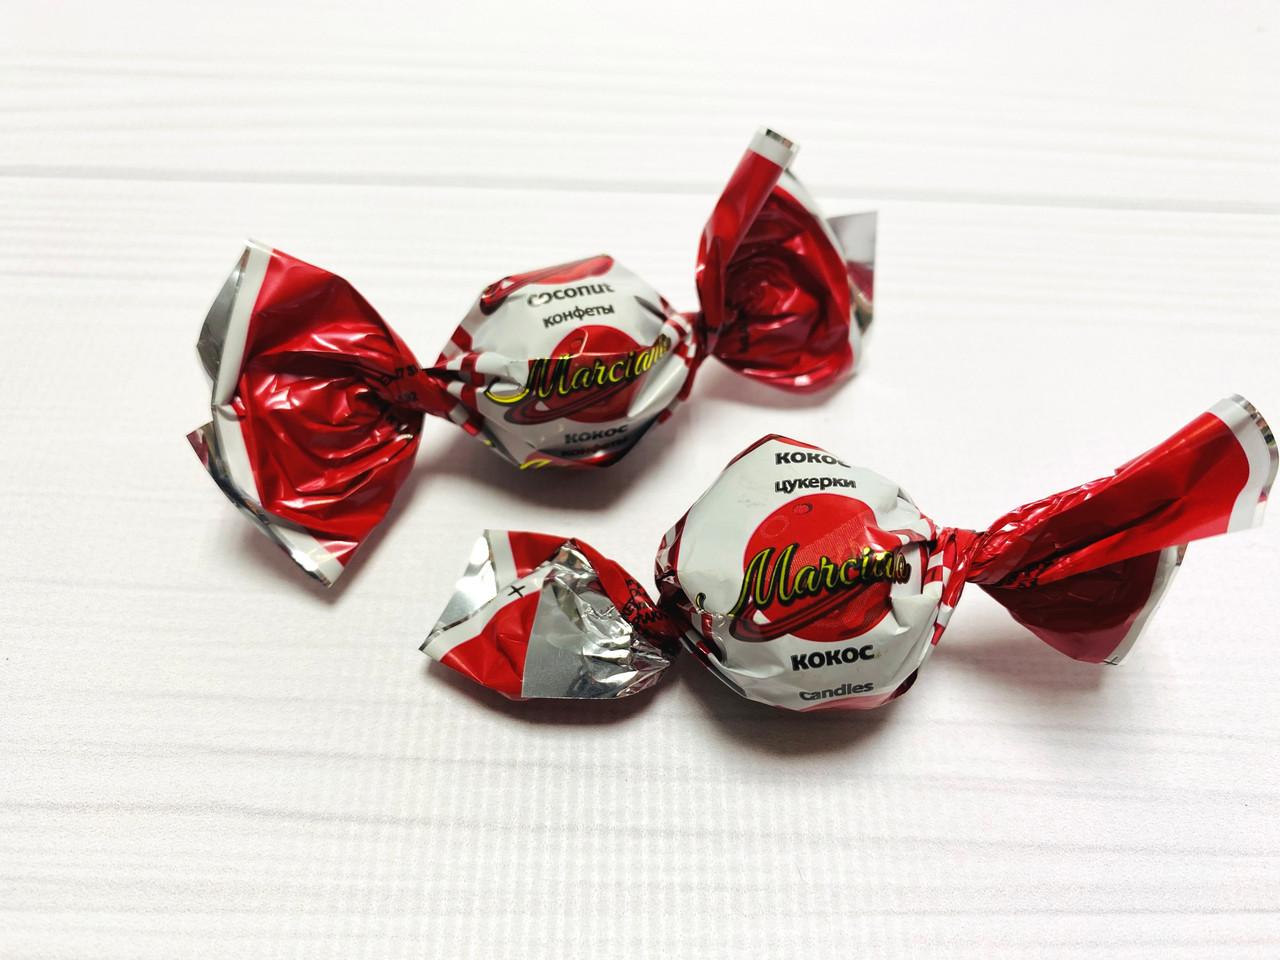 Конфеты Марсиано кокос 1,5кг.